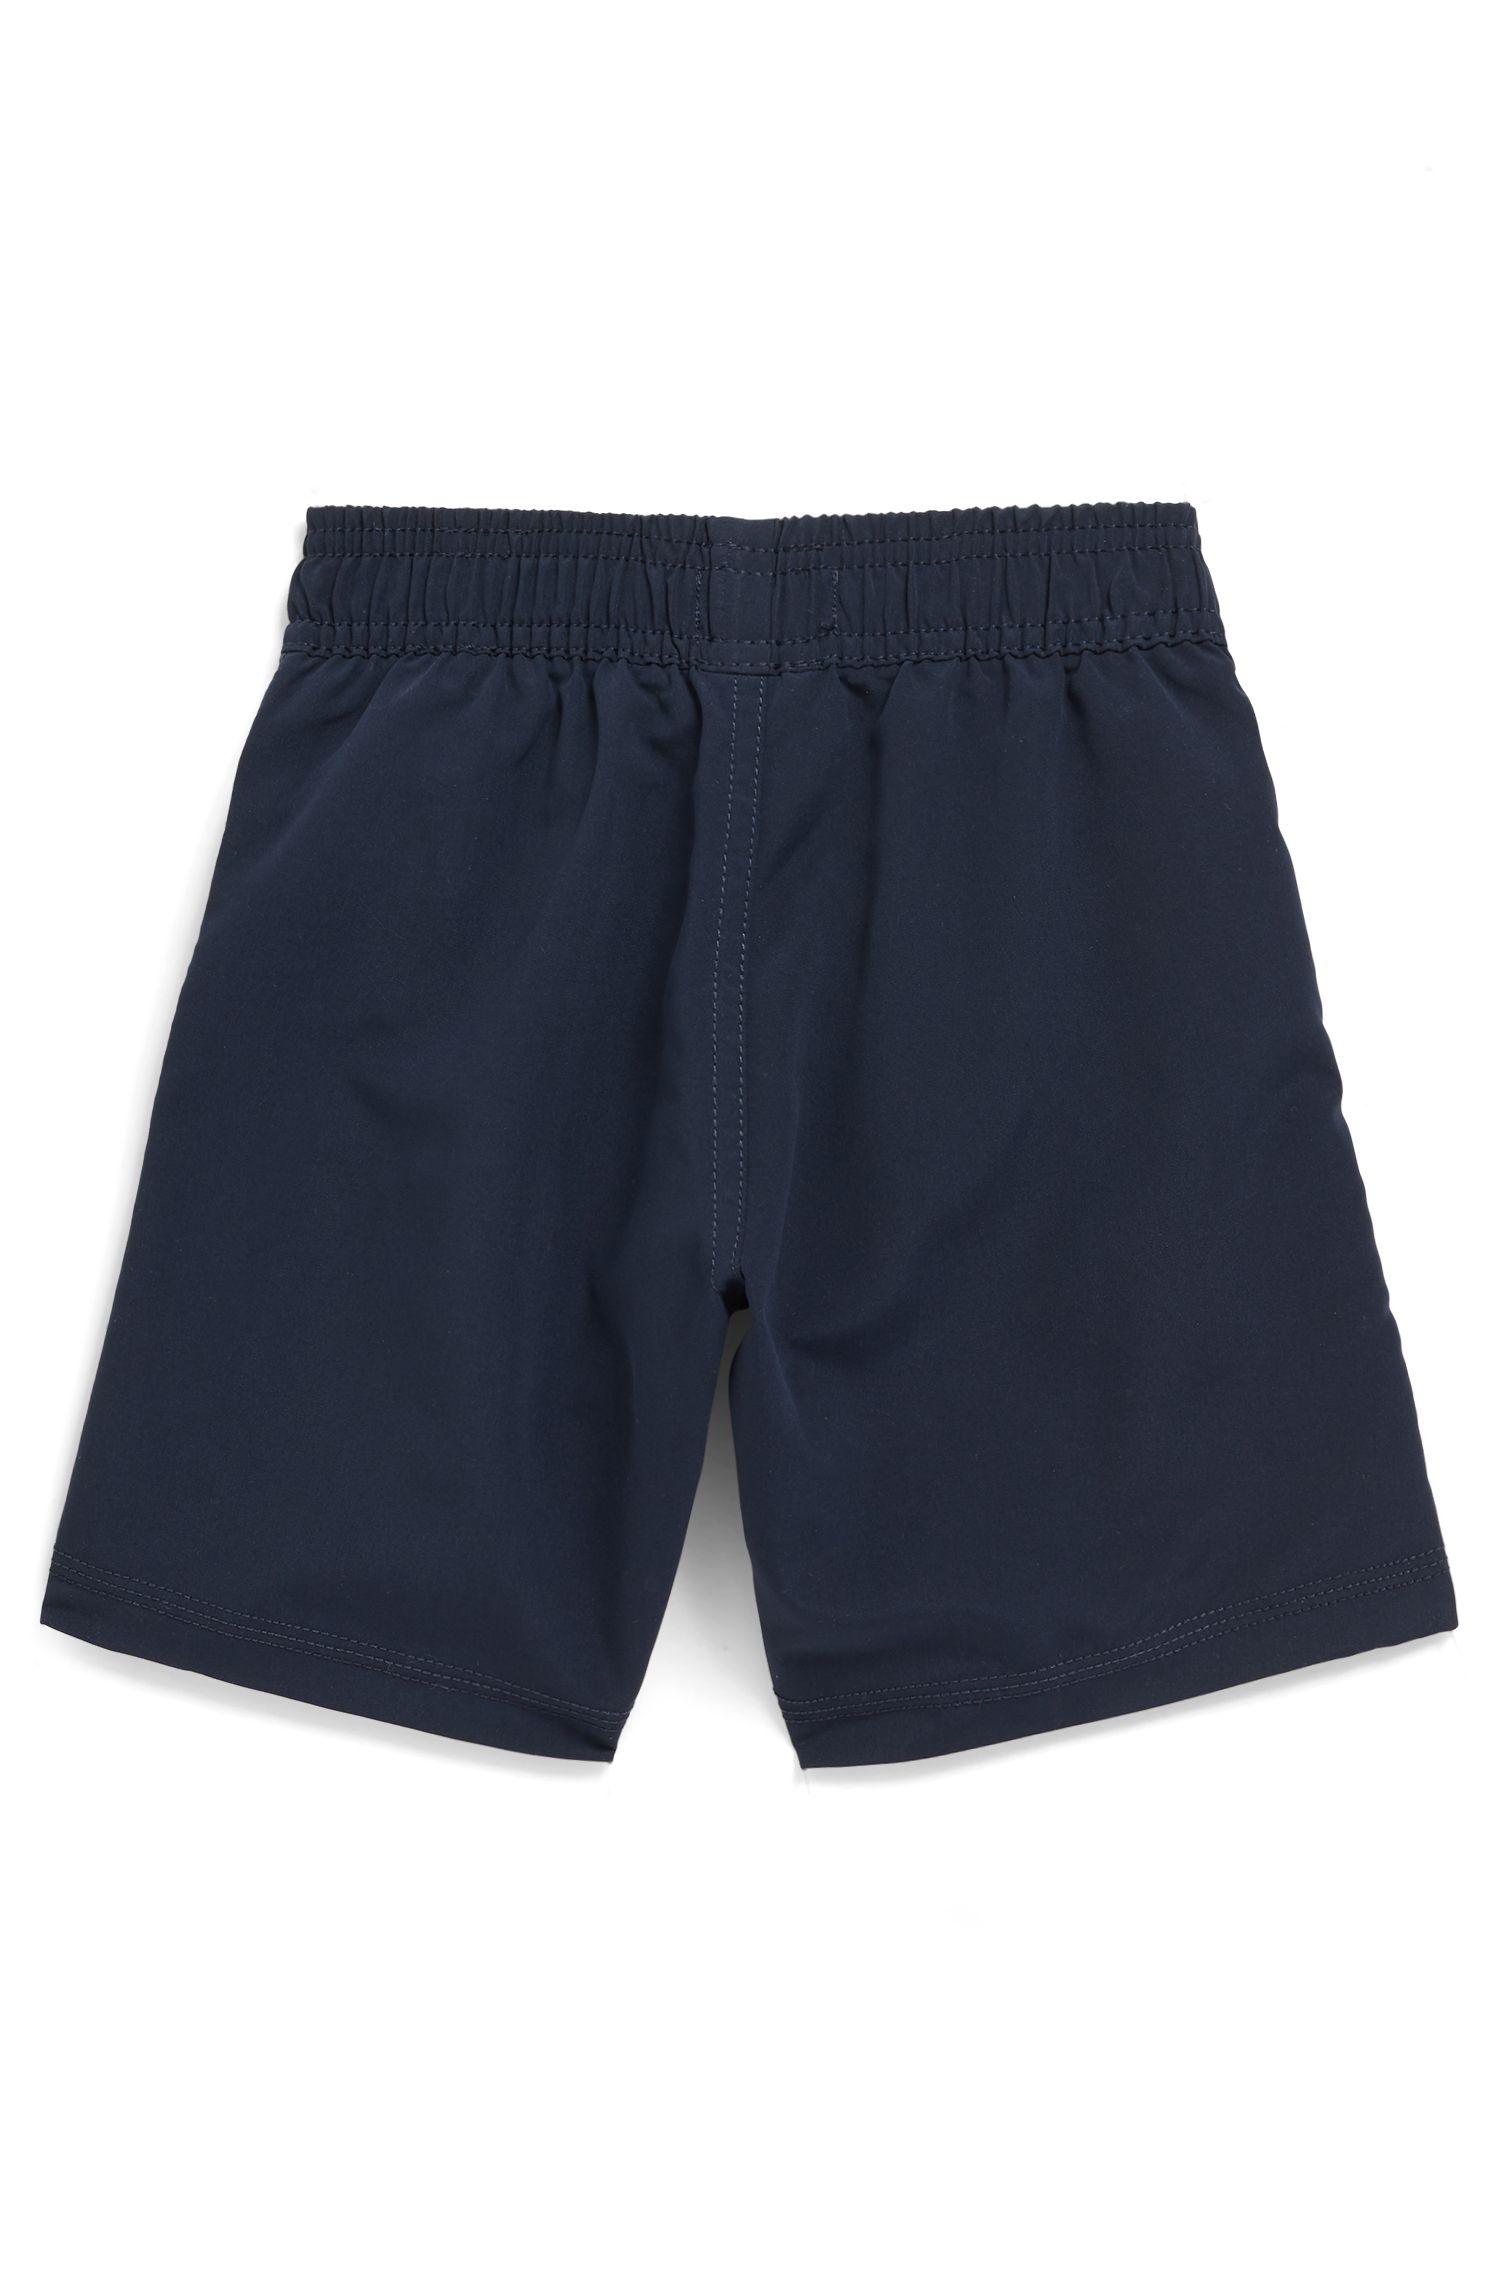 Kids' logo swim shorts in quick-drying technical fabric, Dark Blue